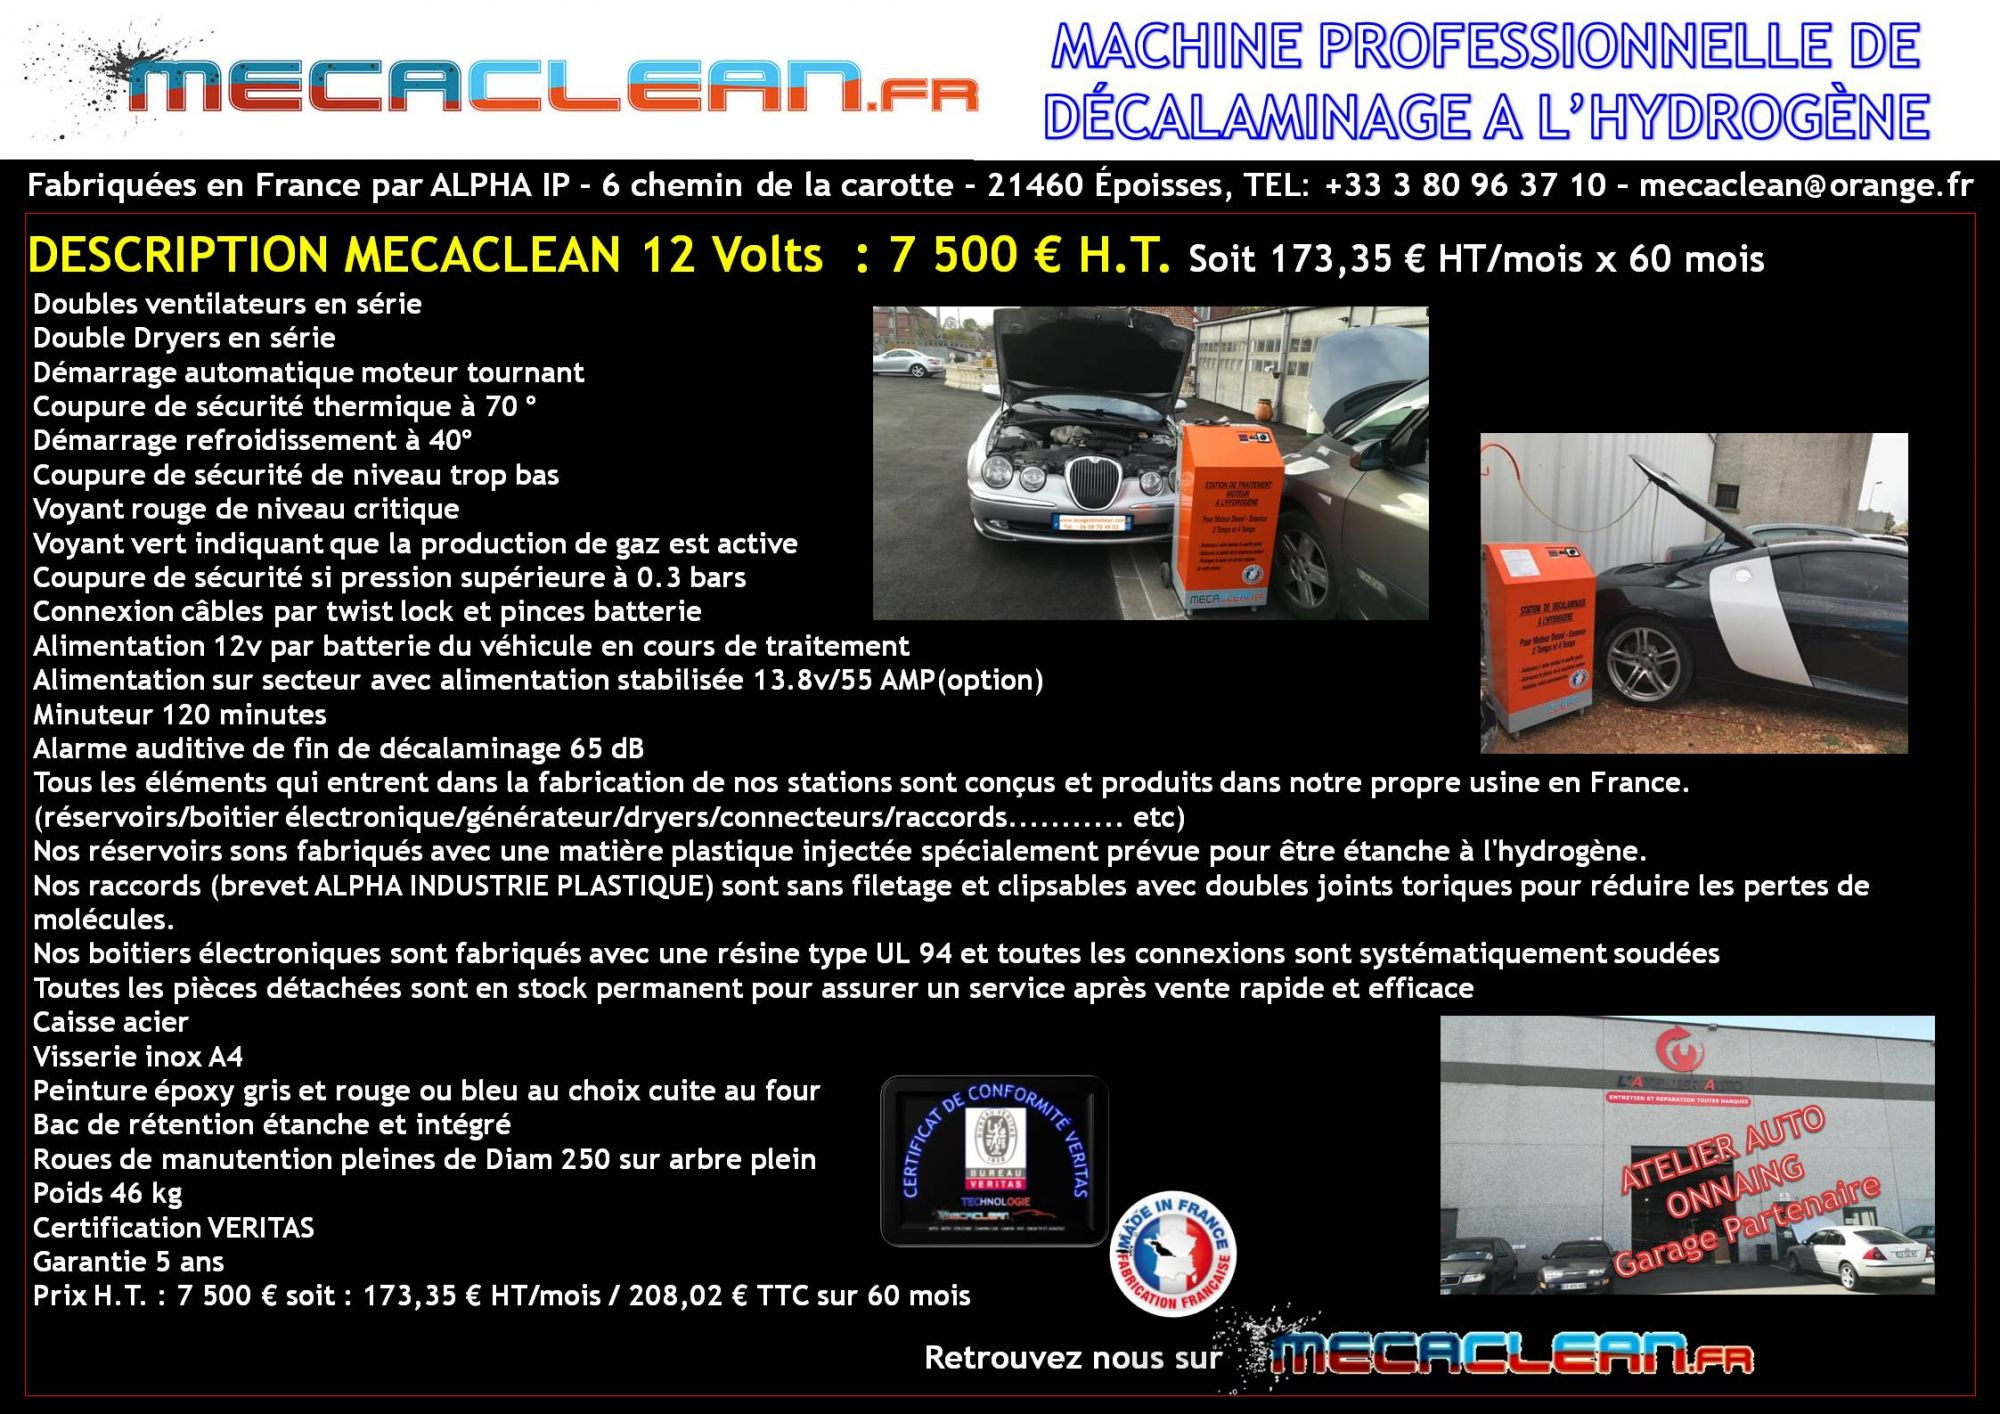 distributeur-mecaclean-4-jpeg